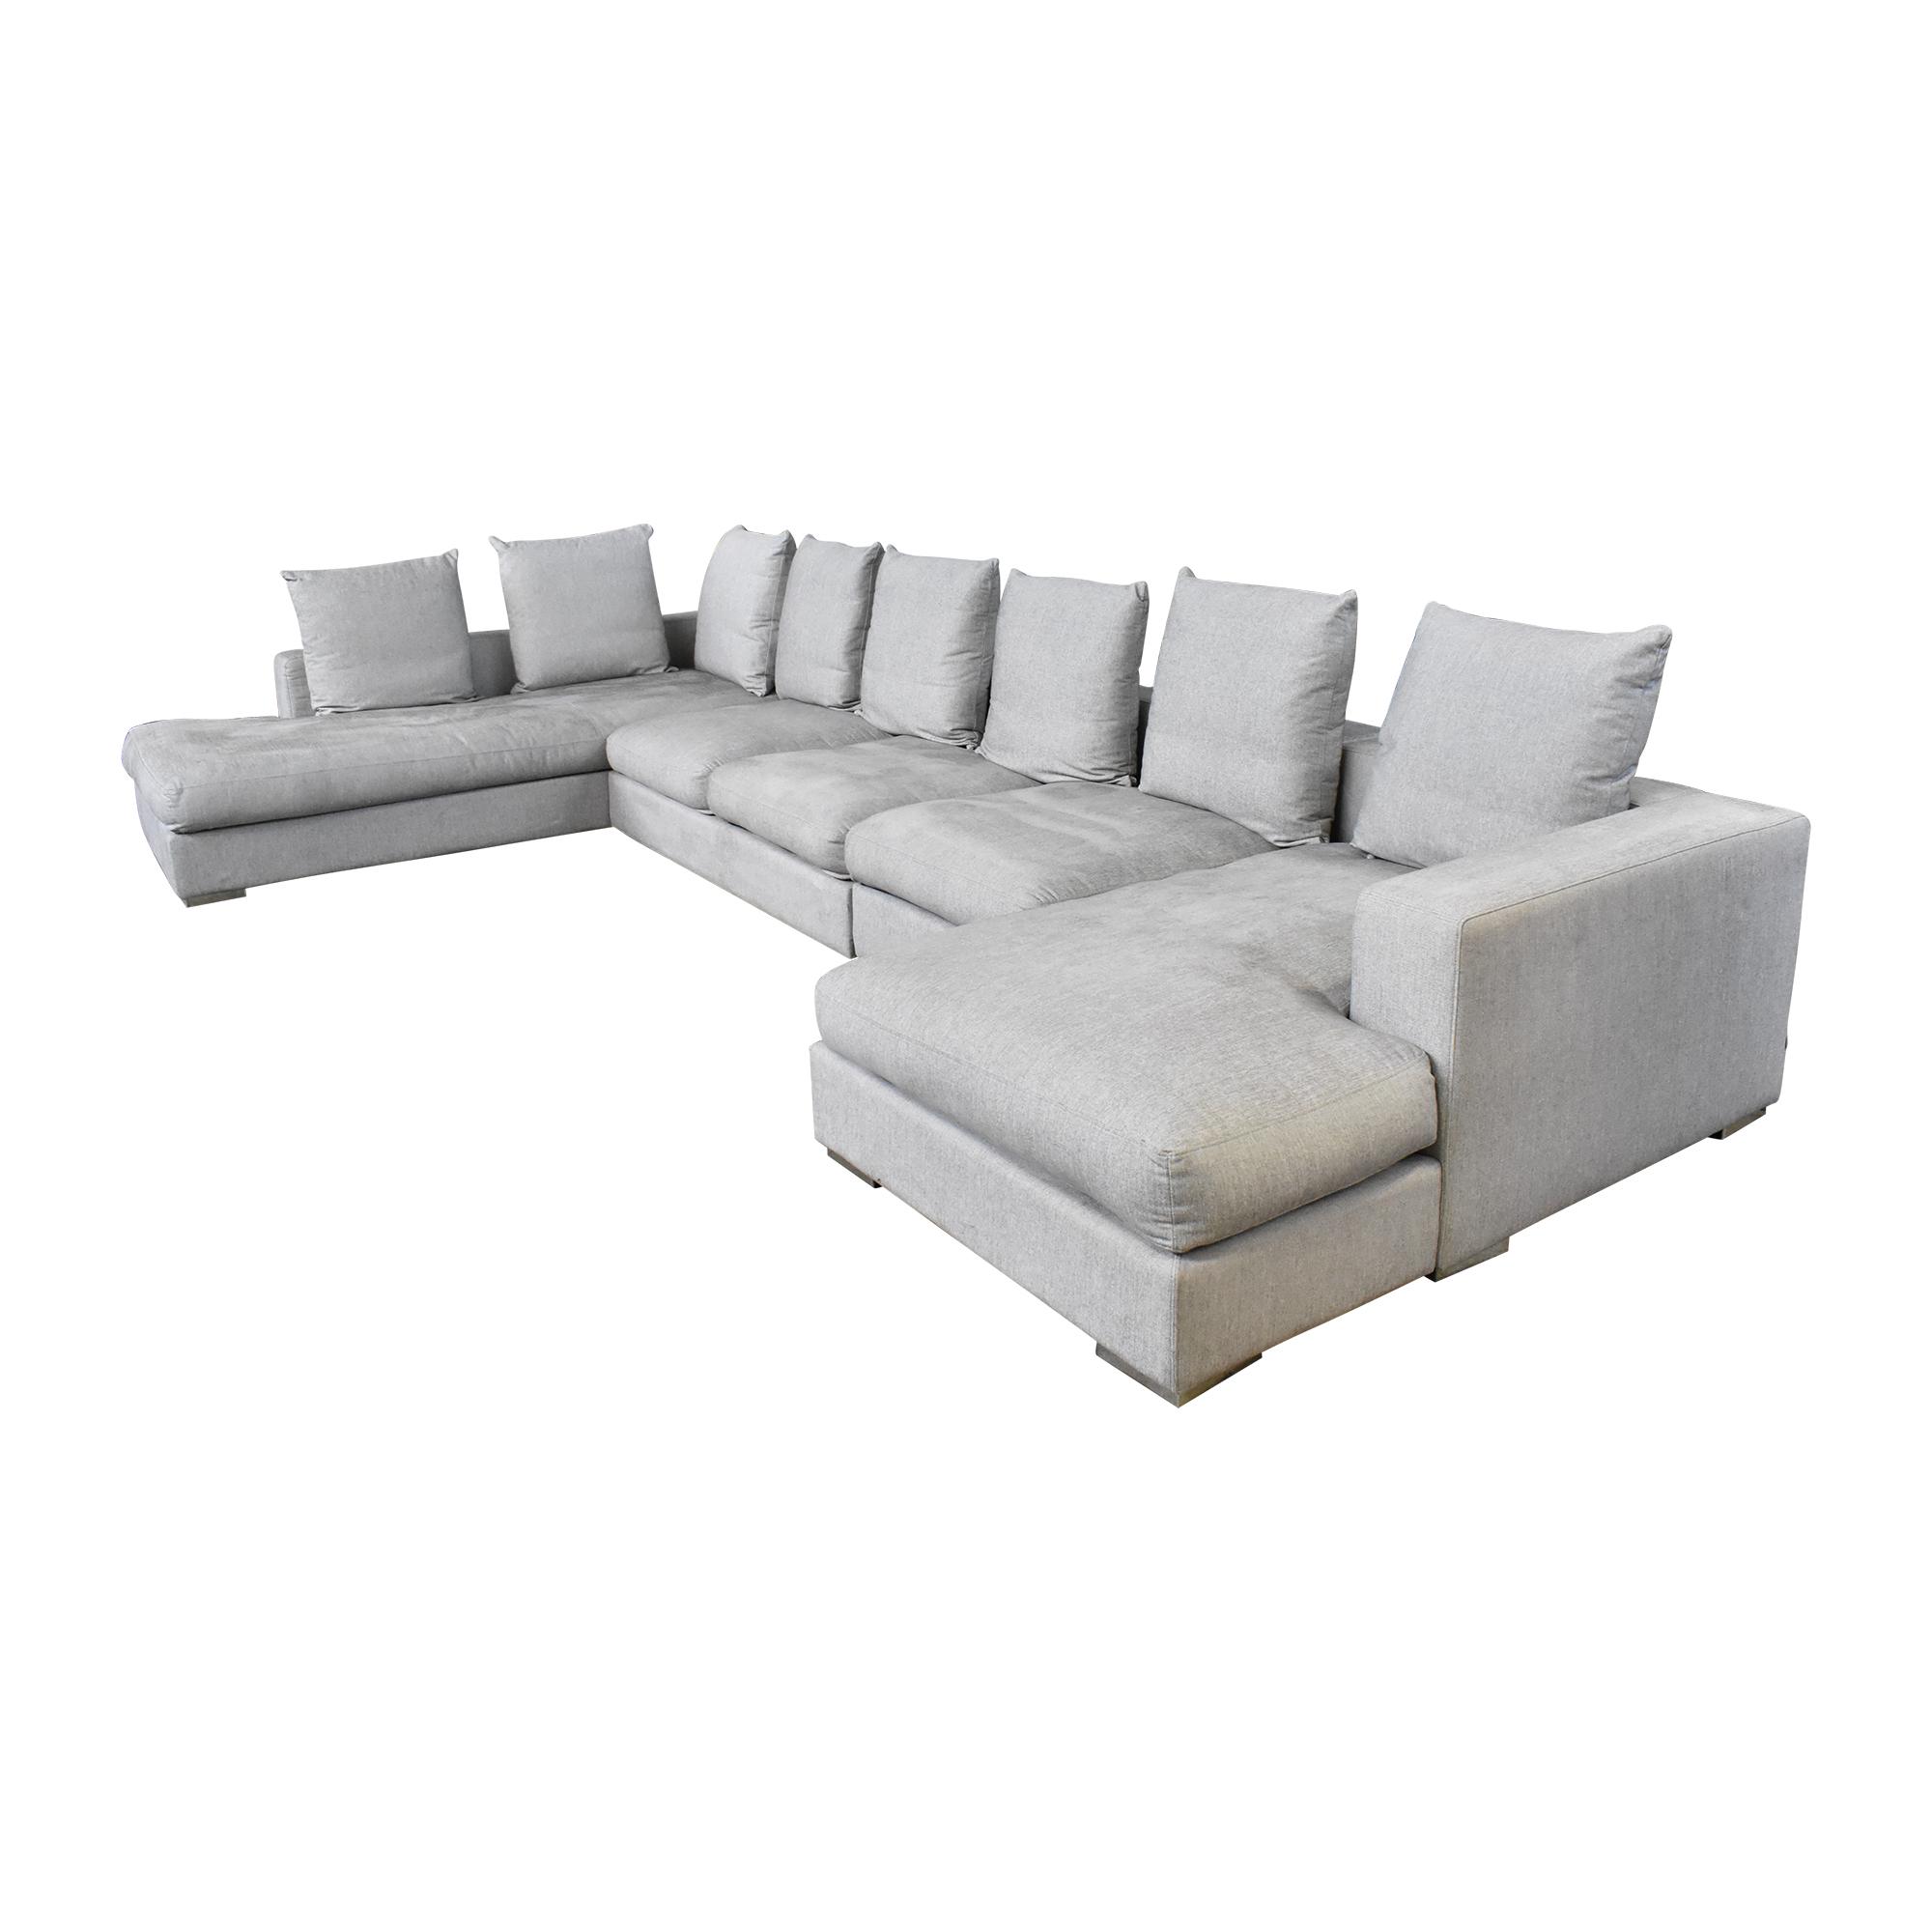 BoConcept BoConcept Cenova Sectional Sofa nj